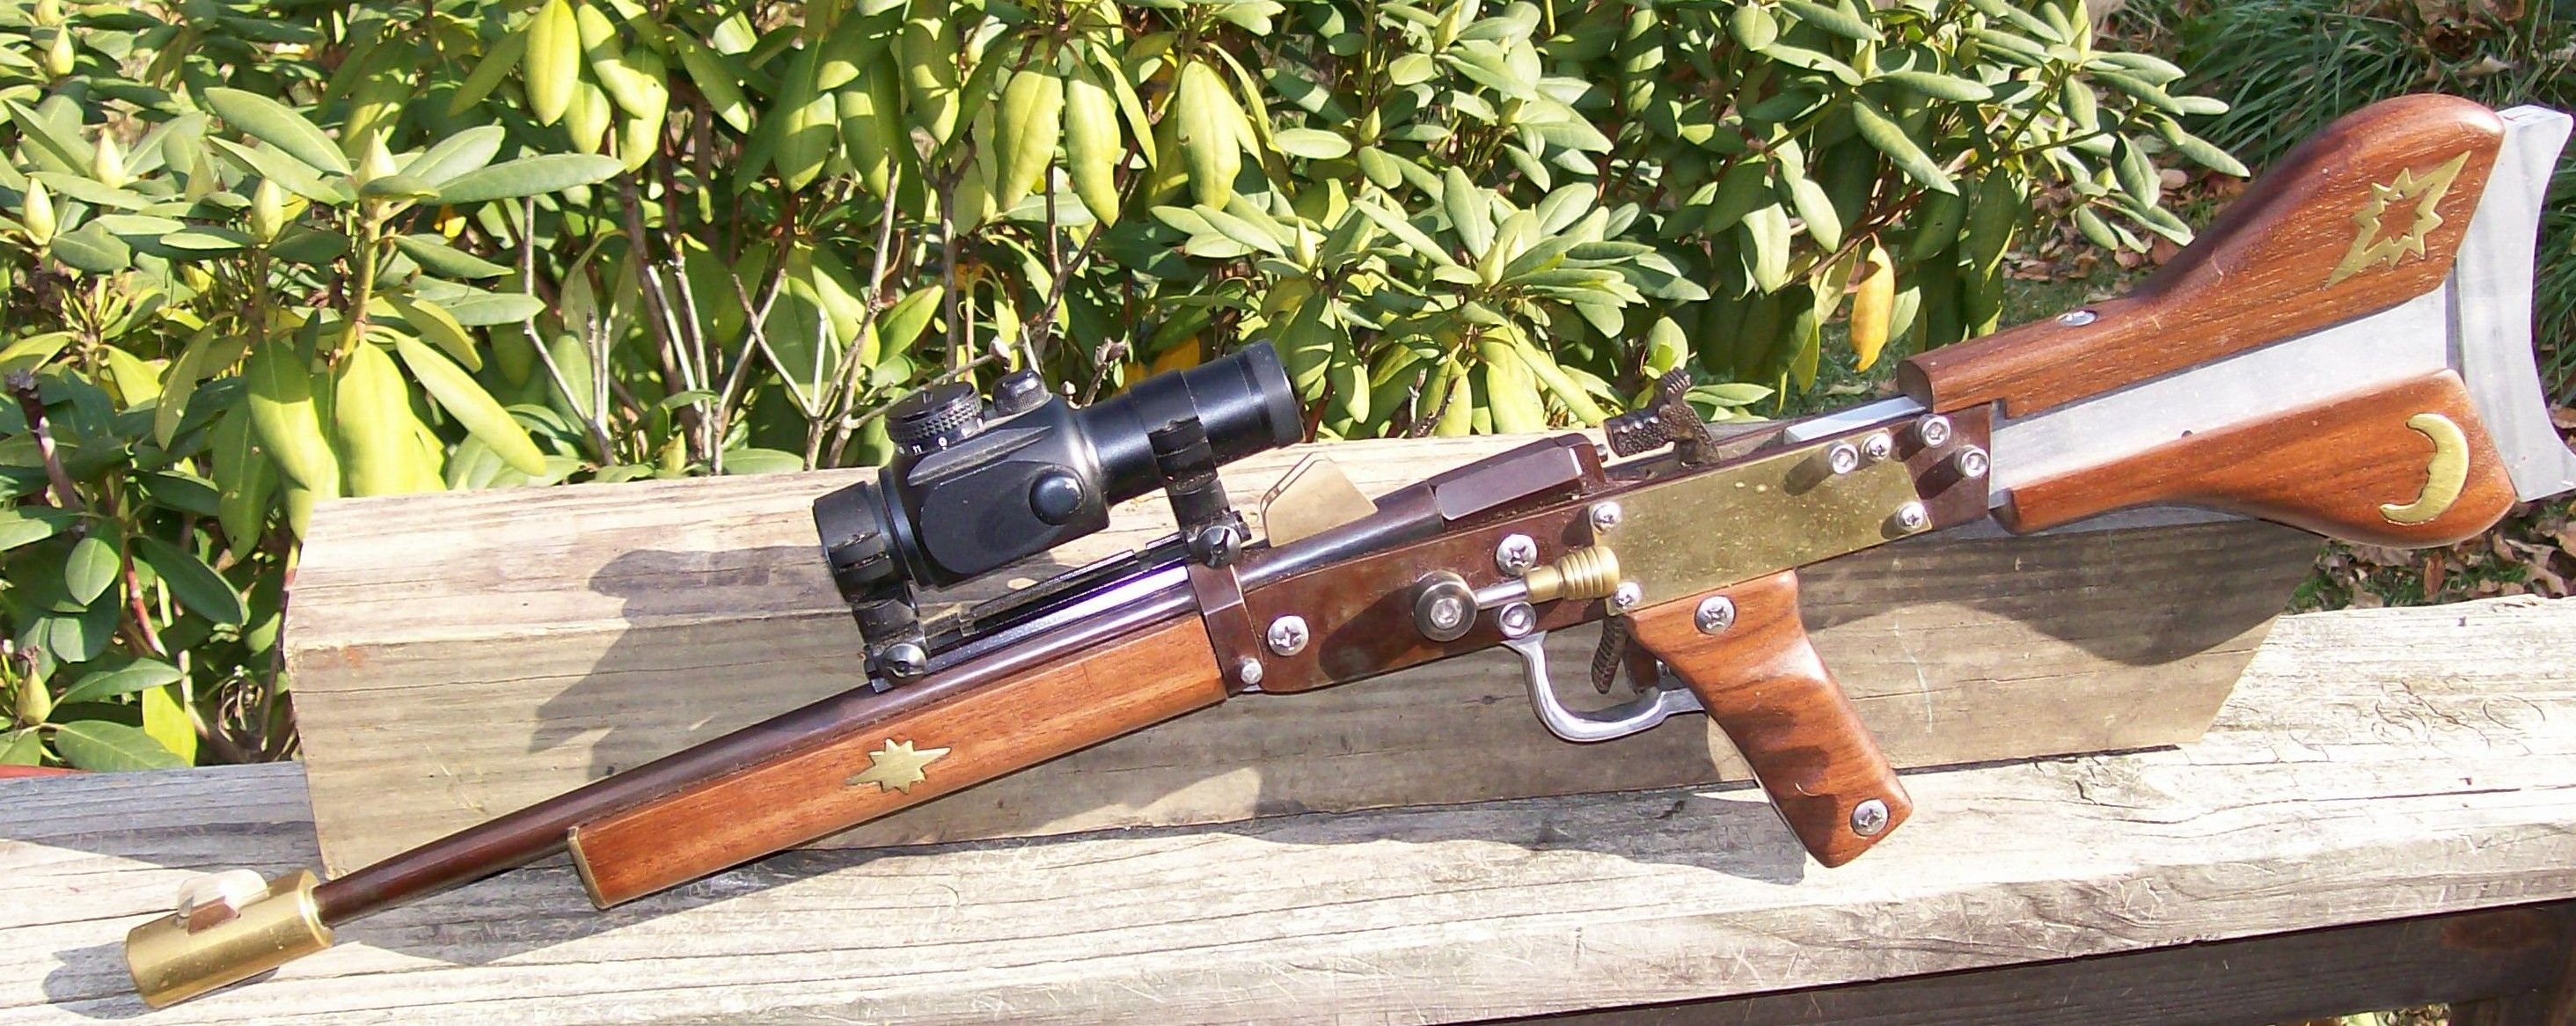 Pin on Air Rifle